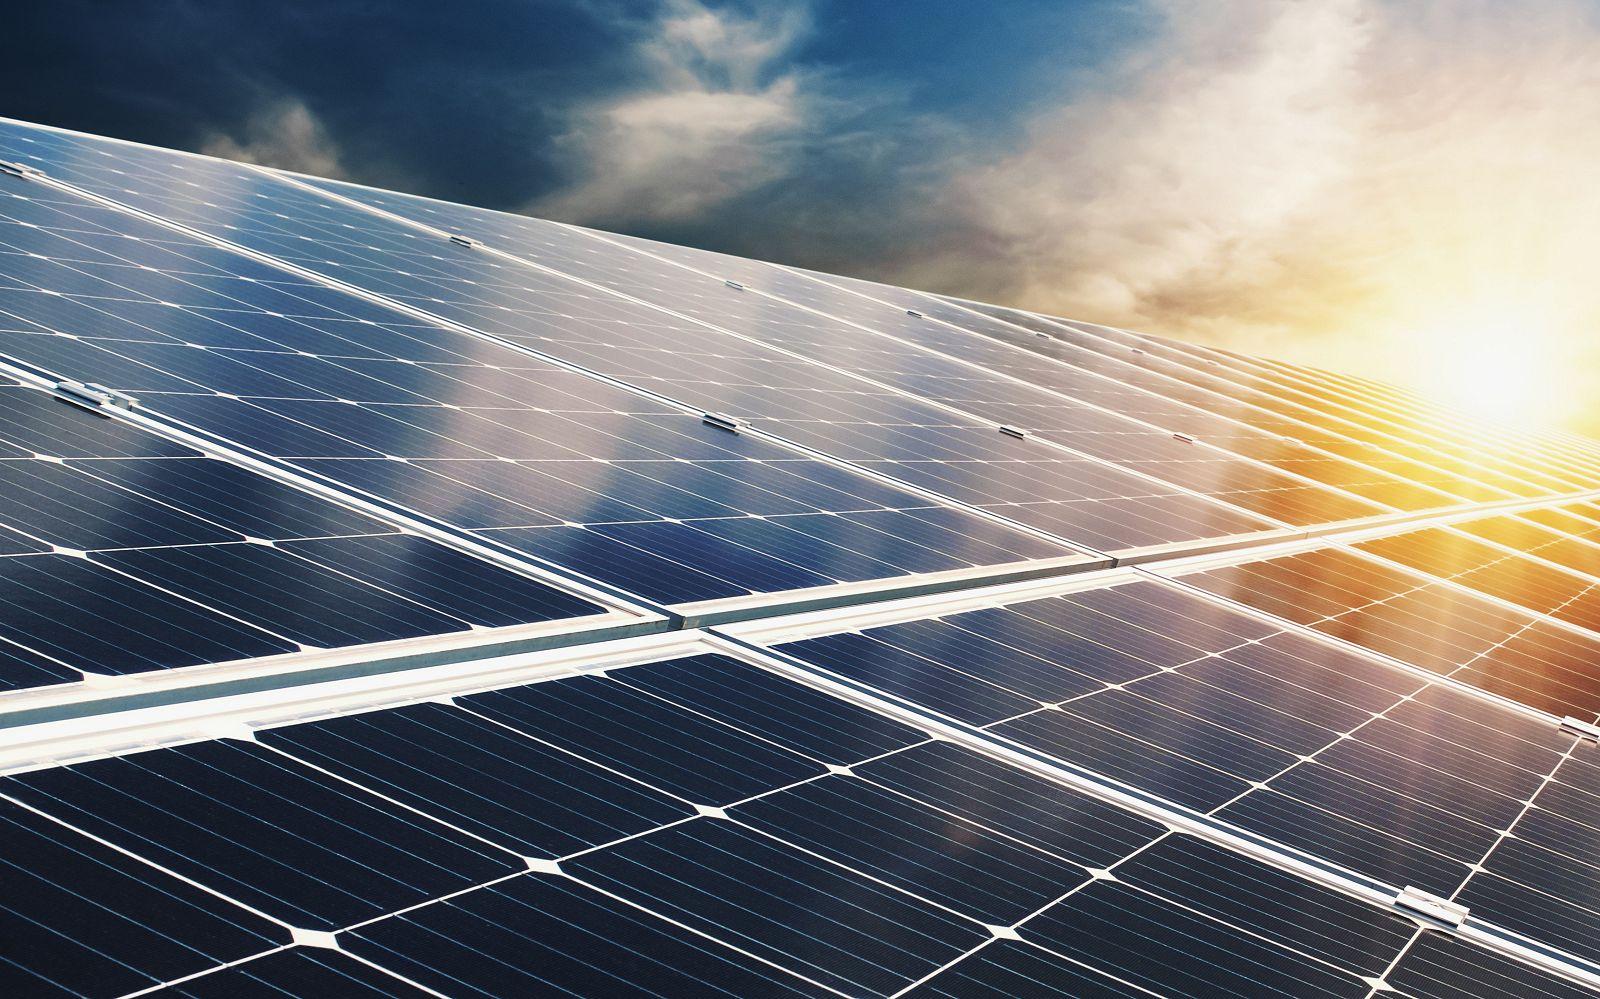 Use of solar energy in Denmark